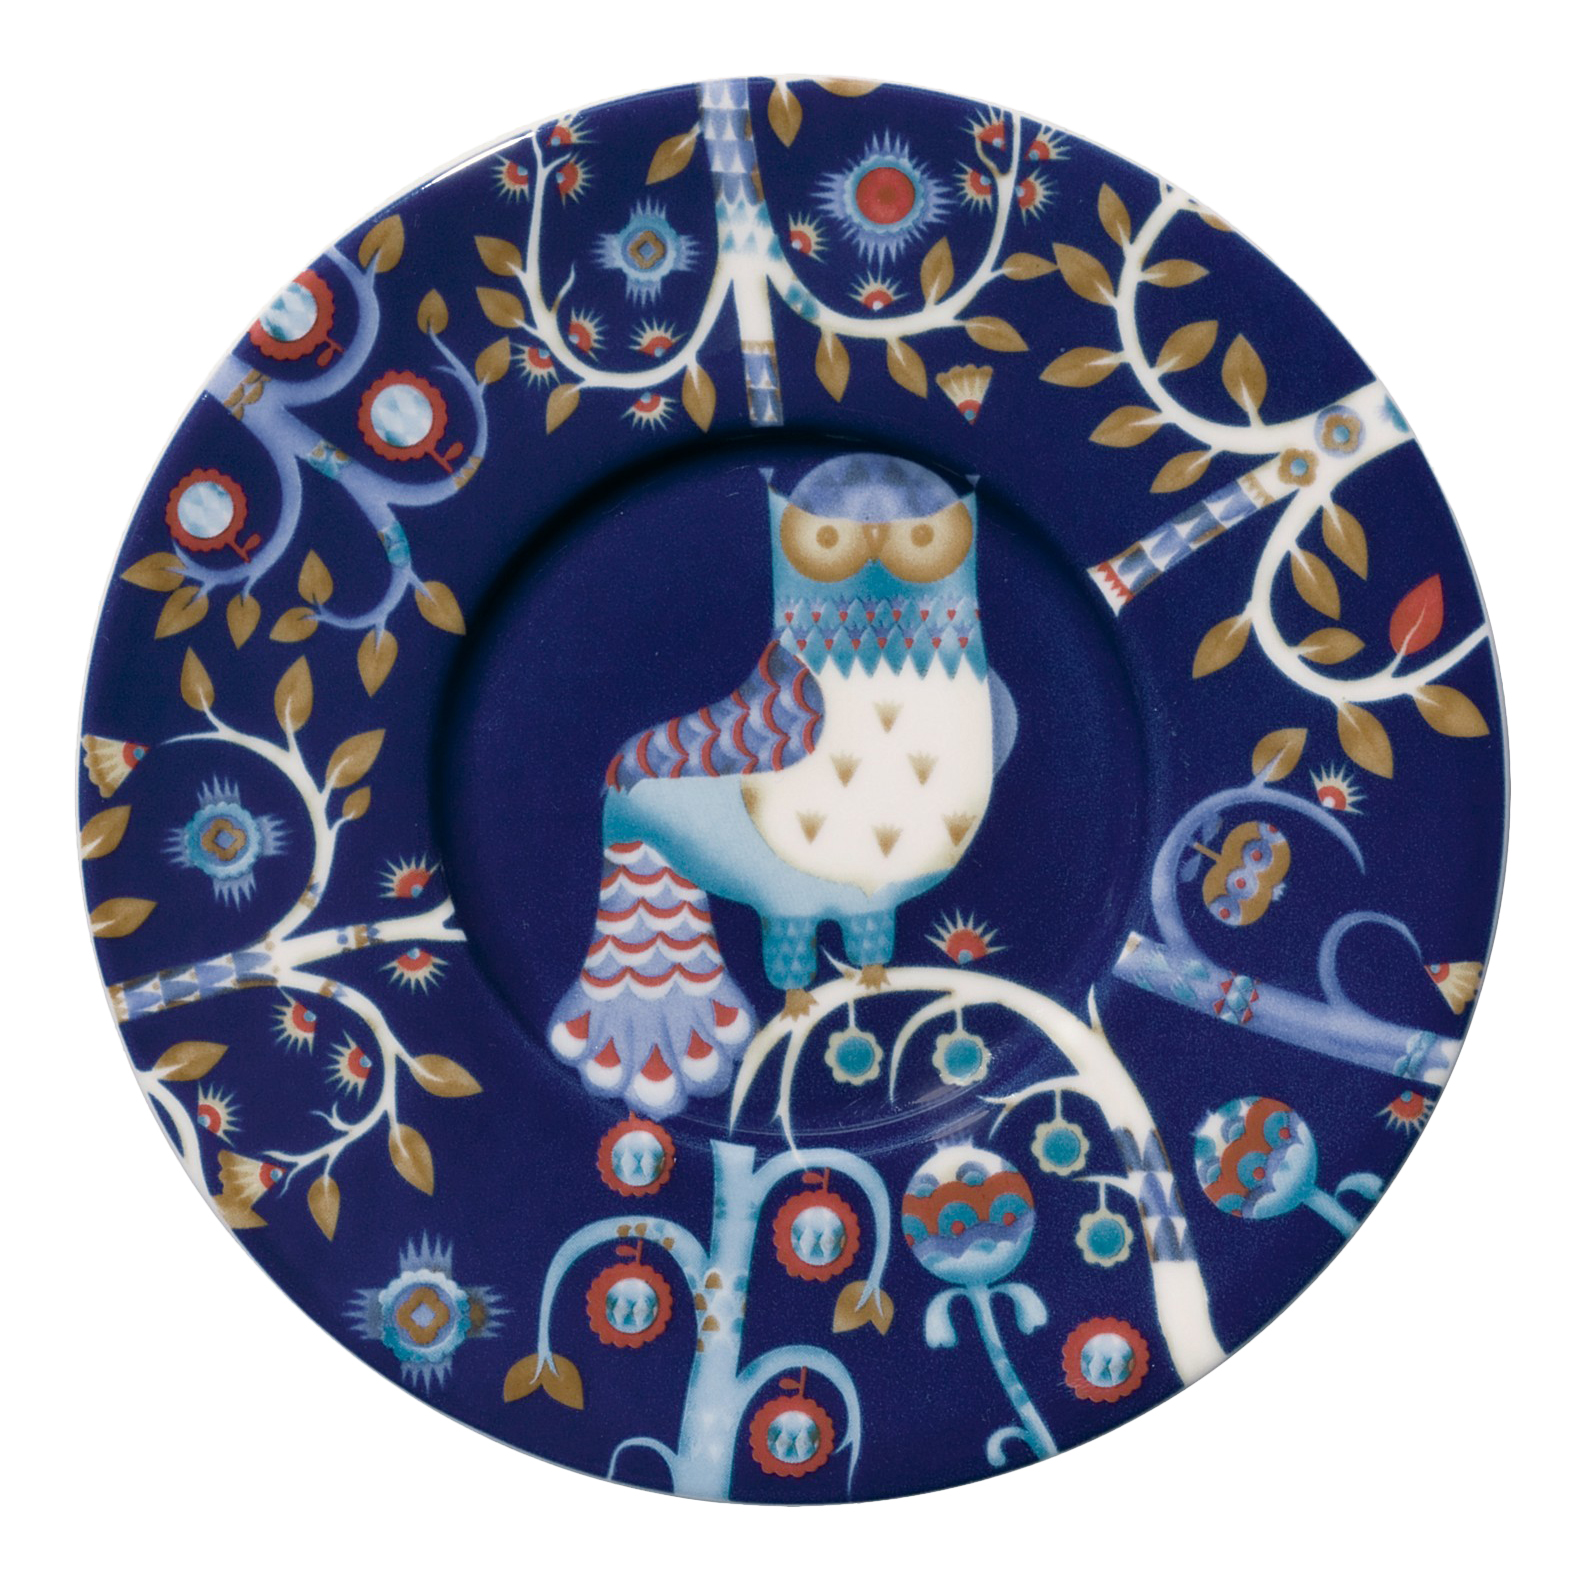 Блюдце Iittala Taika 15 см синее